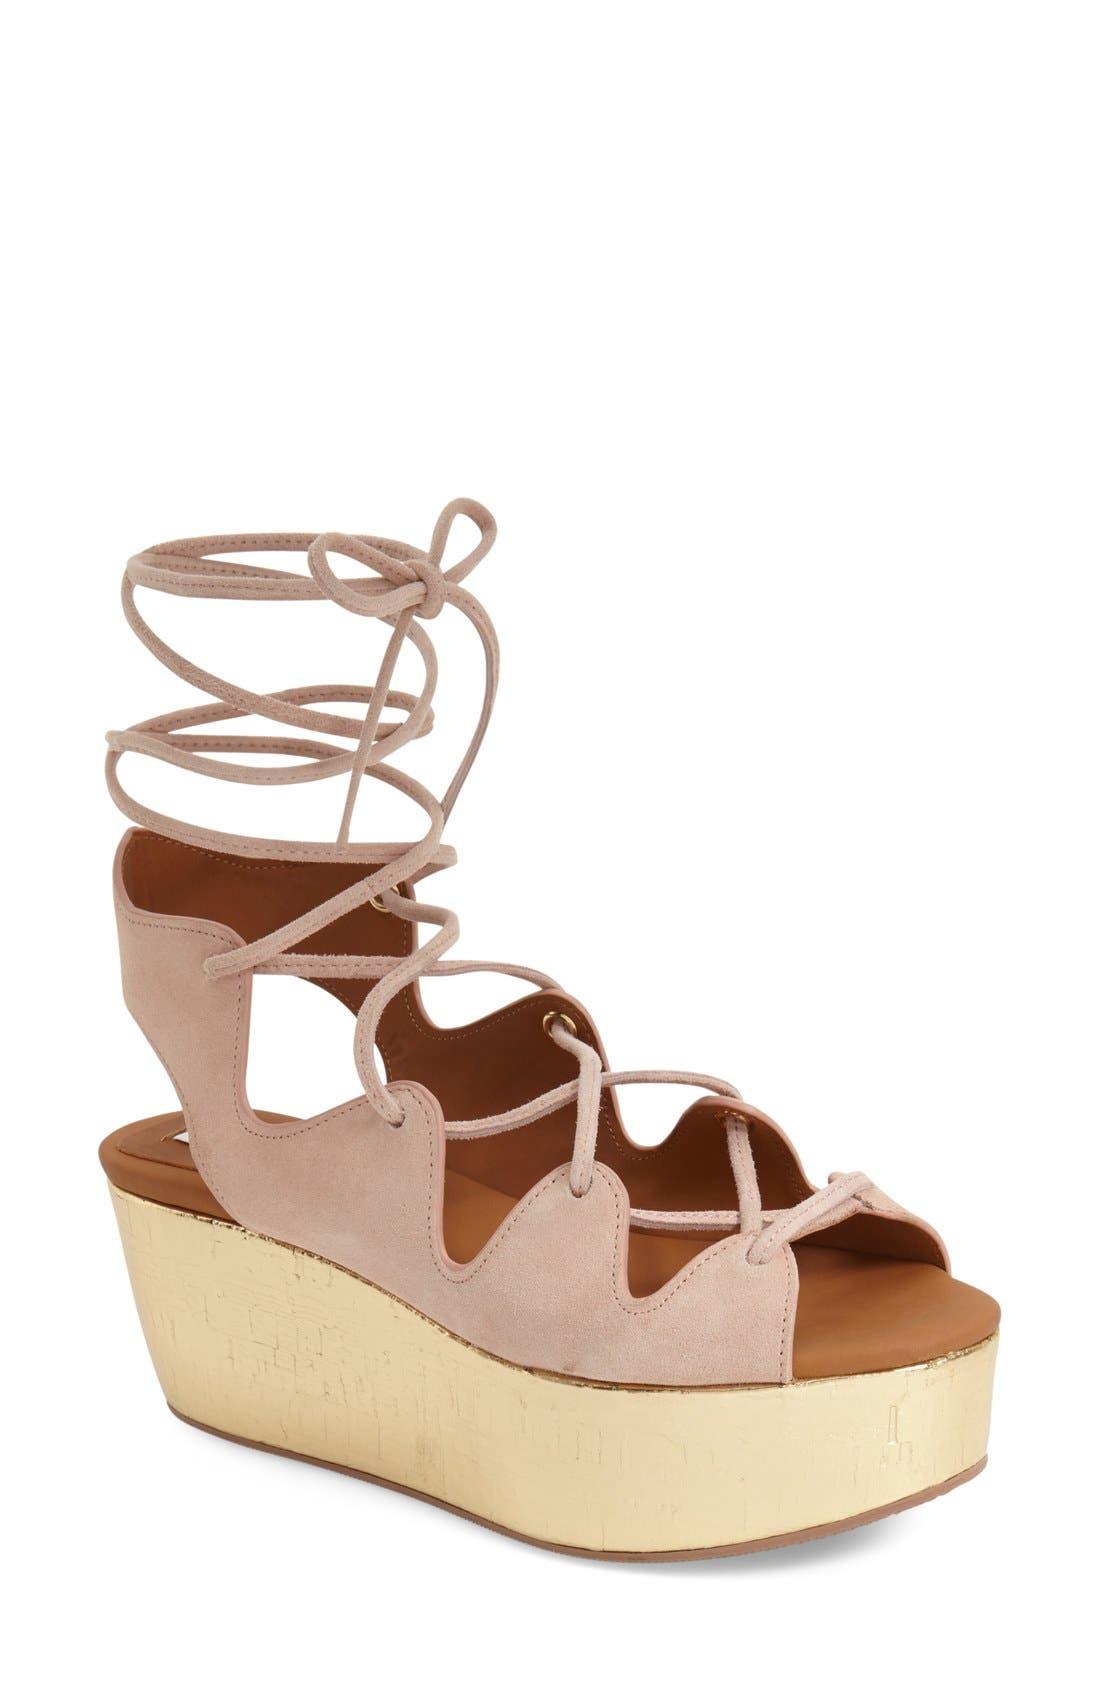 Main Image - See by Chloé 'Liana' Platform Wedge Sandal (Women)